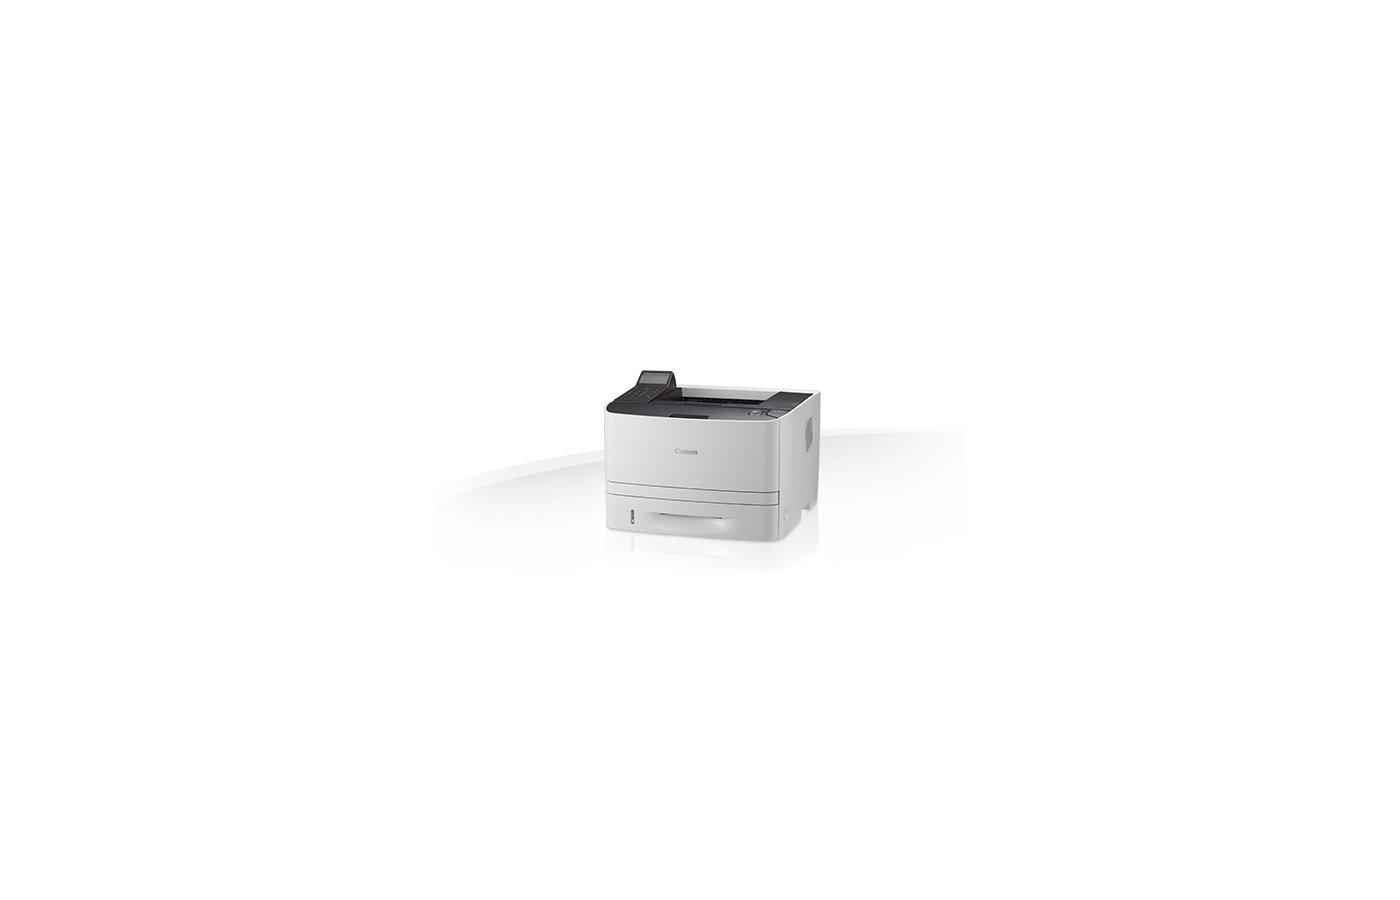 Принтер Canon i-SENSYS LBP251dw /0281C010/